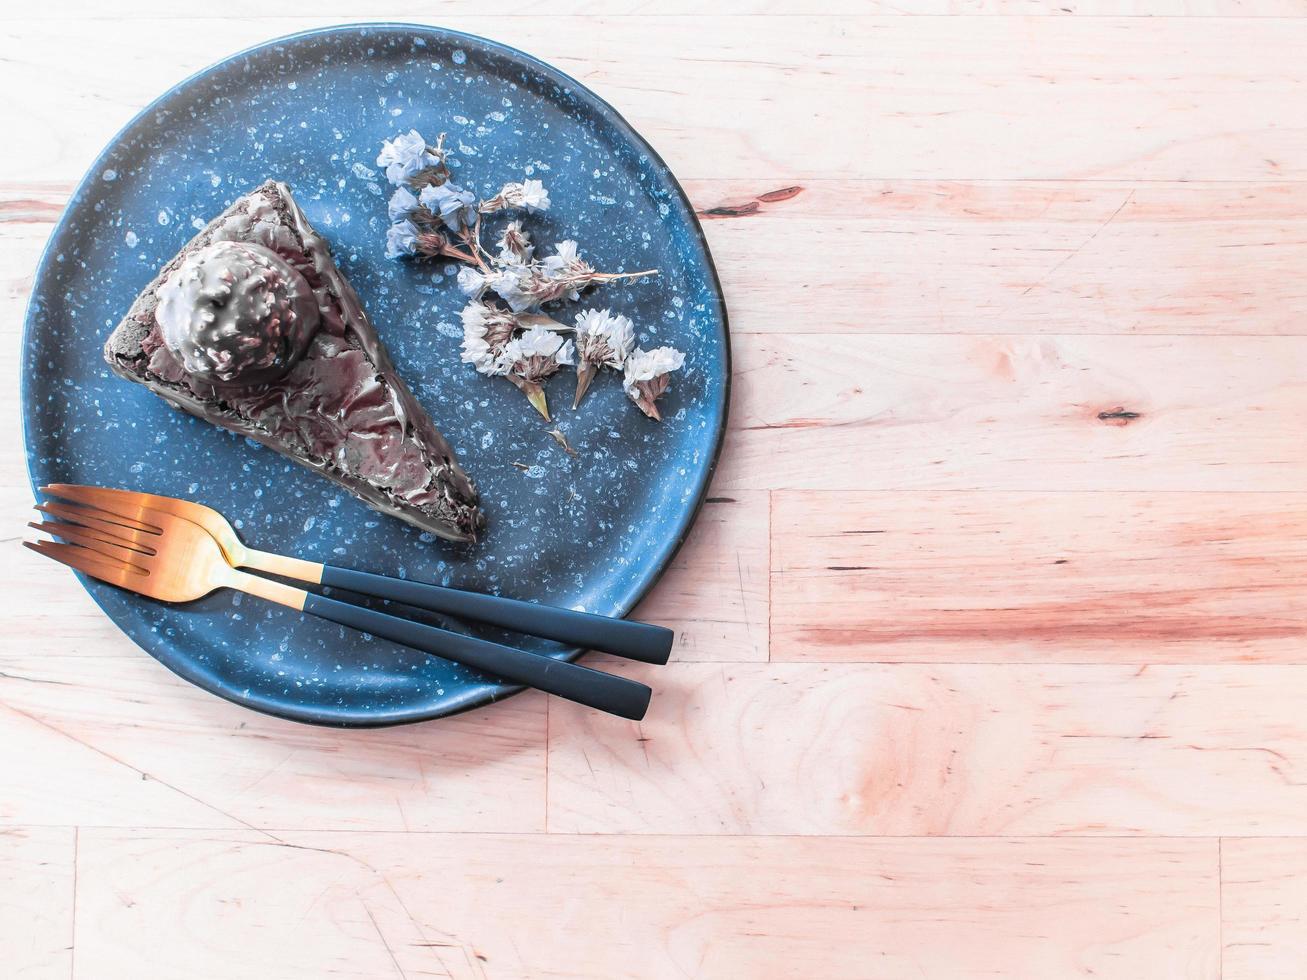 plano de pastel en plato azul foto